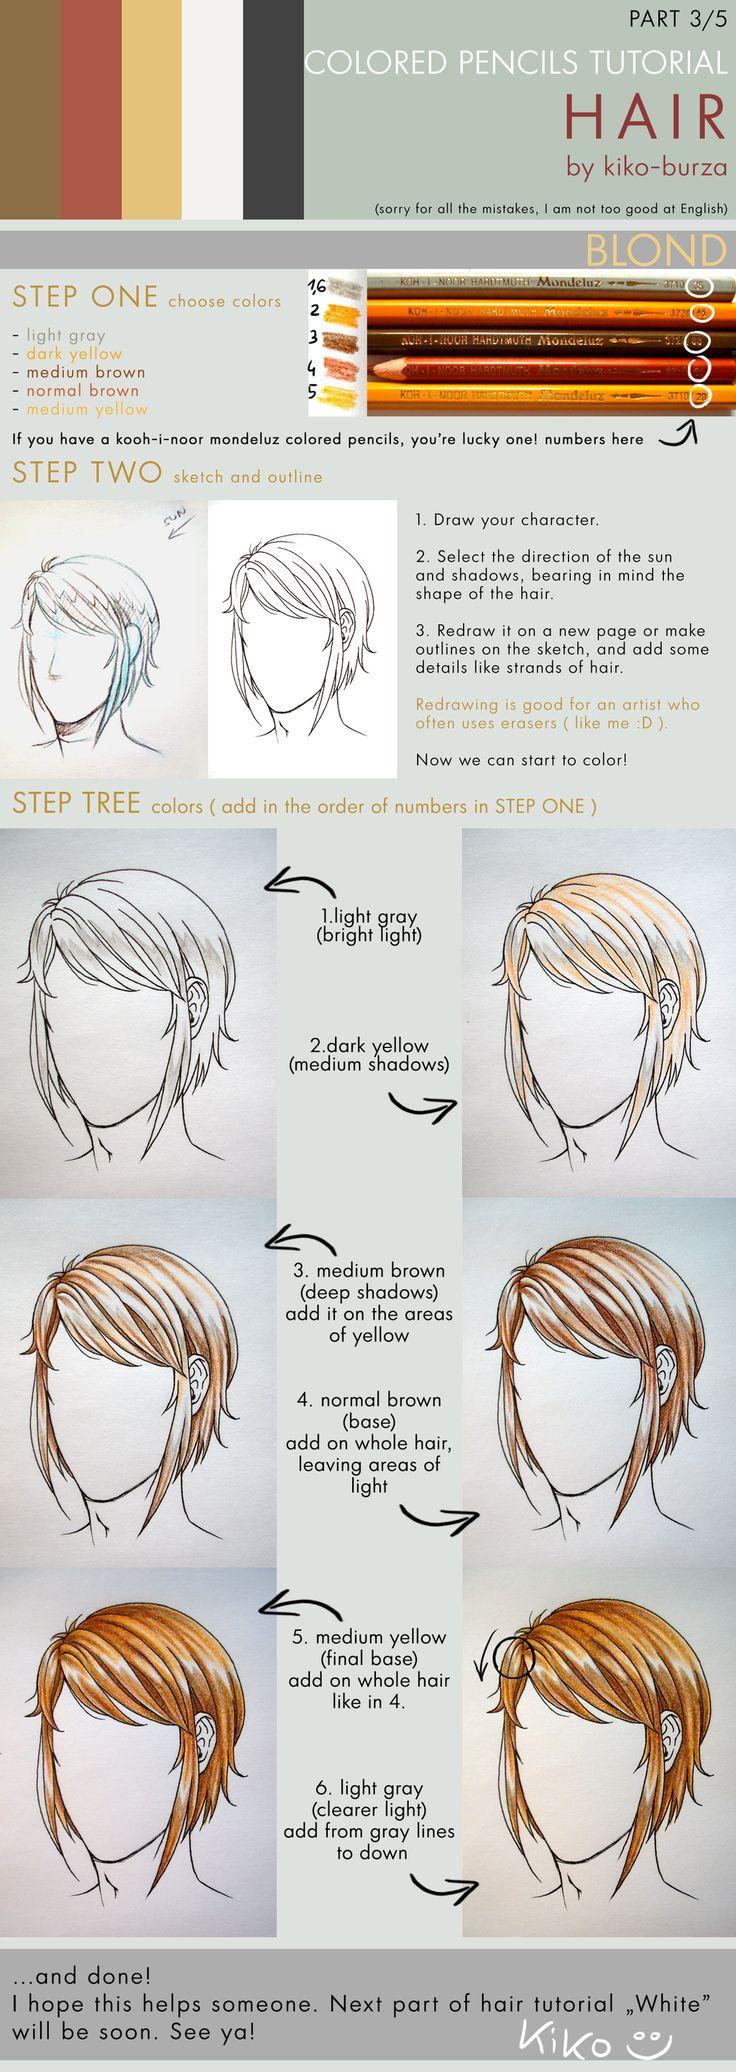 Colored pencils tutorial HAIR part 3 - BLOND by kiko-burza.deviantart.com on @DeviantArt